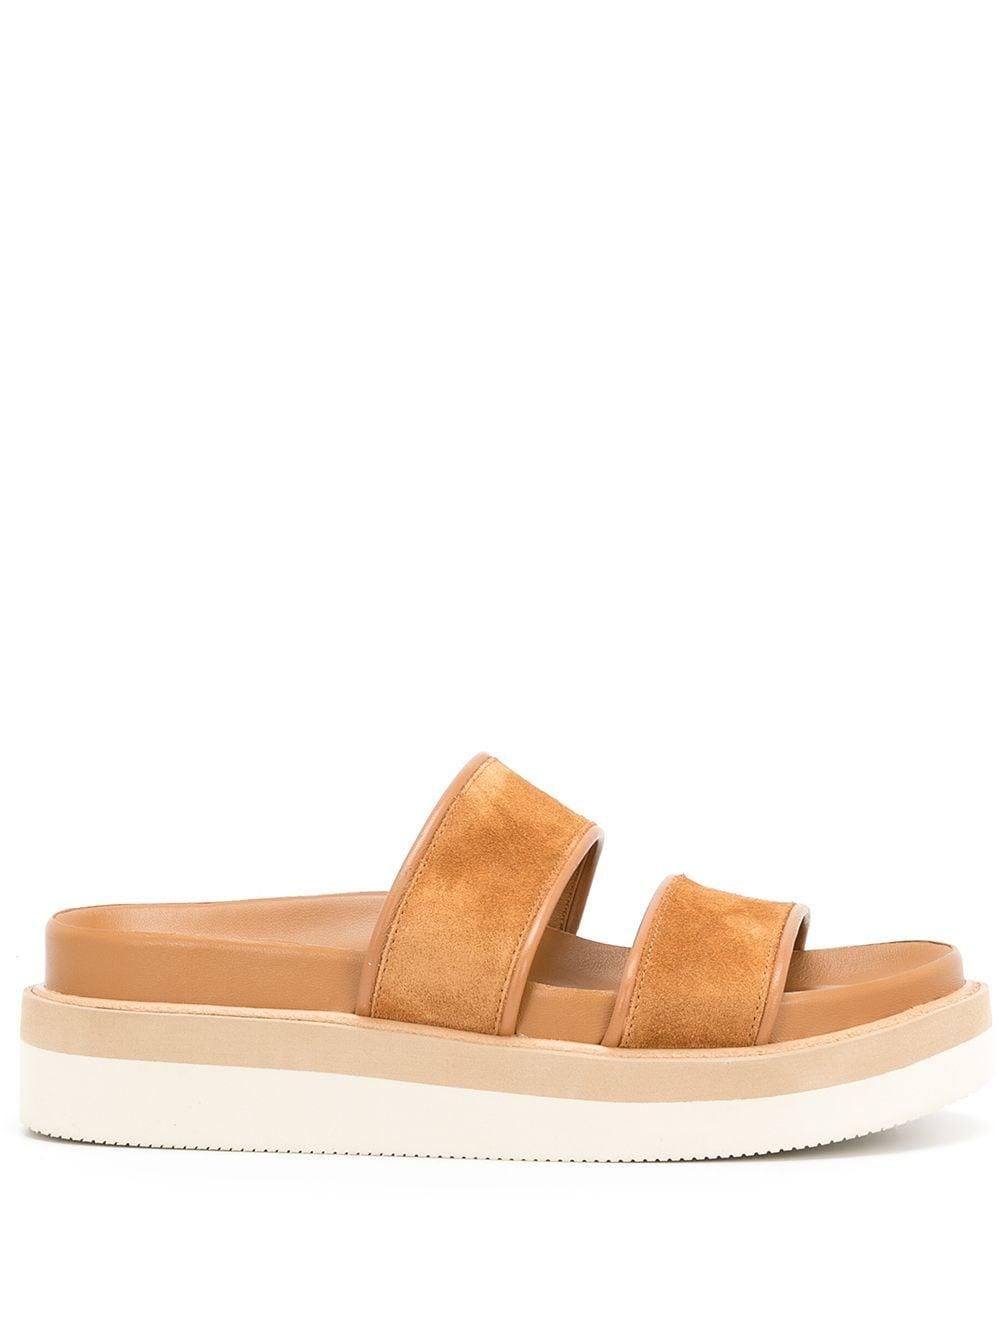 Coco Sport Suede Sandal Item # H6002L1200